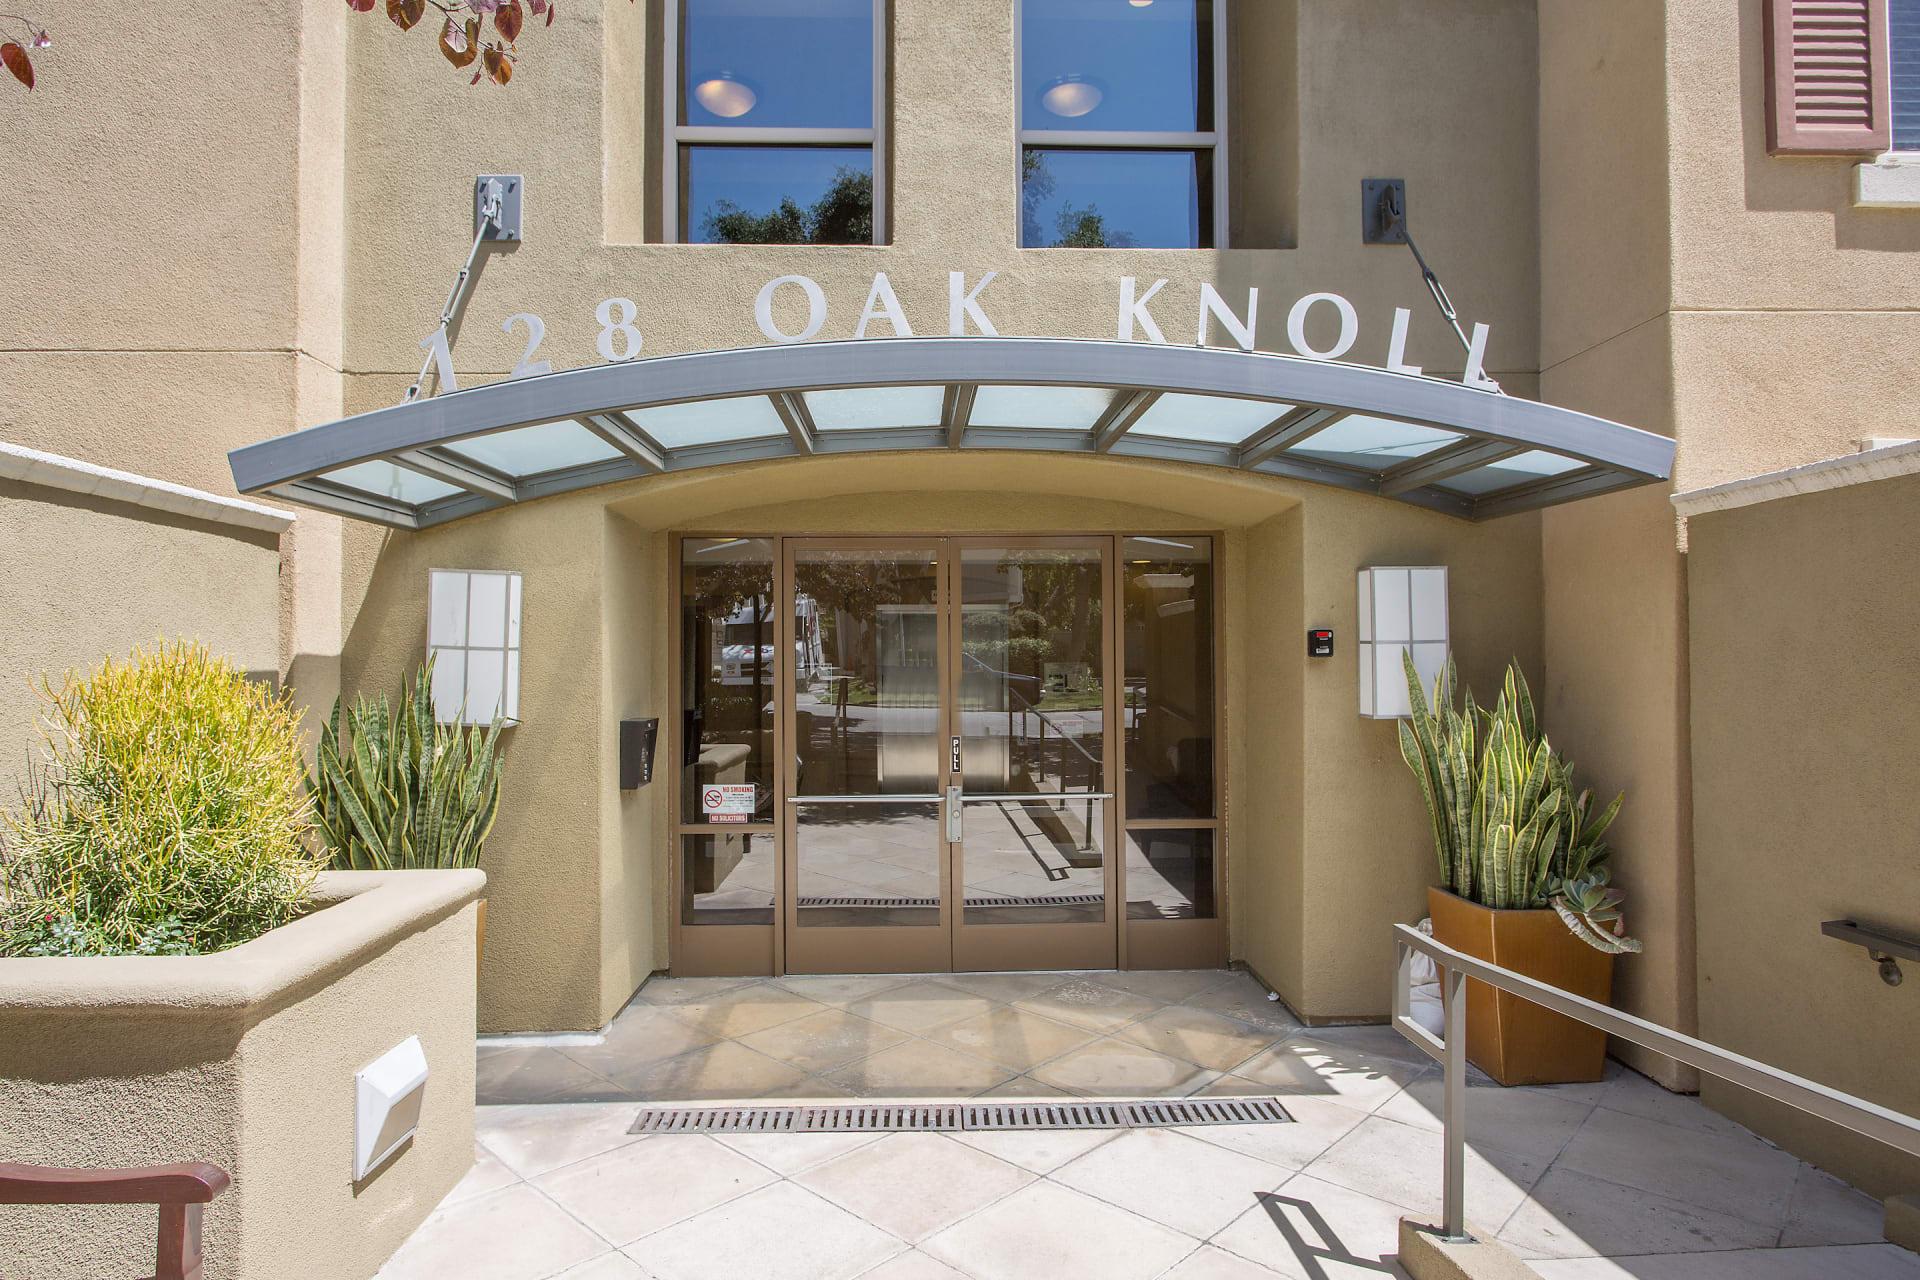 128 N Oak Knoll Ave Unit 306 photo